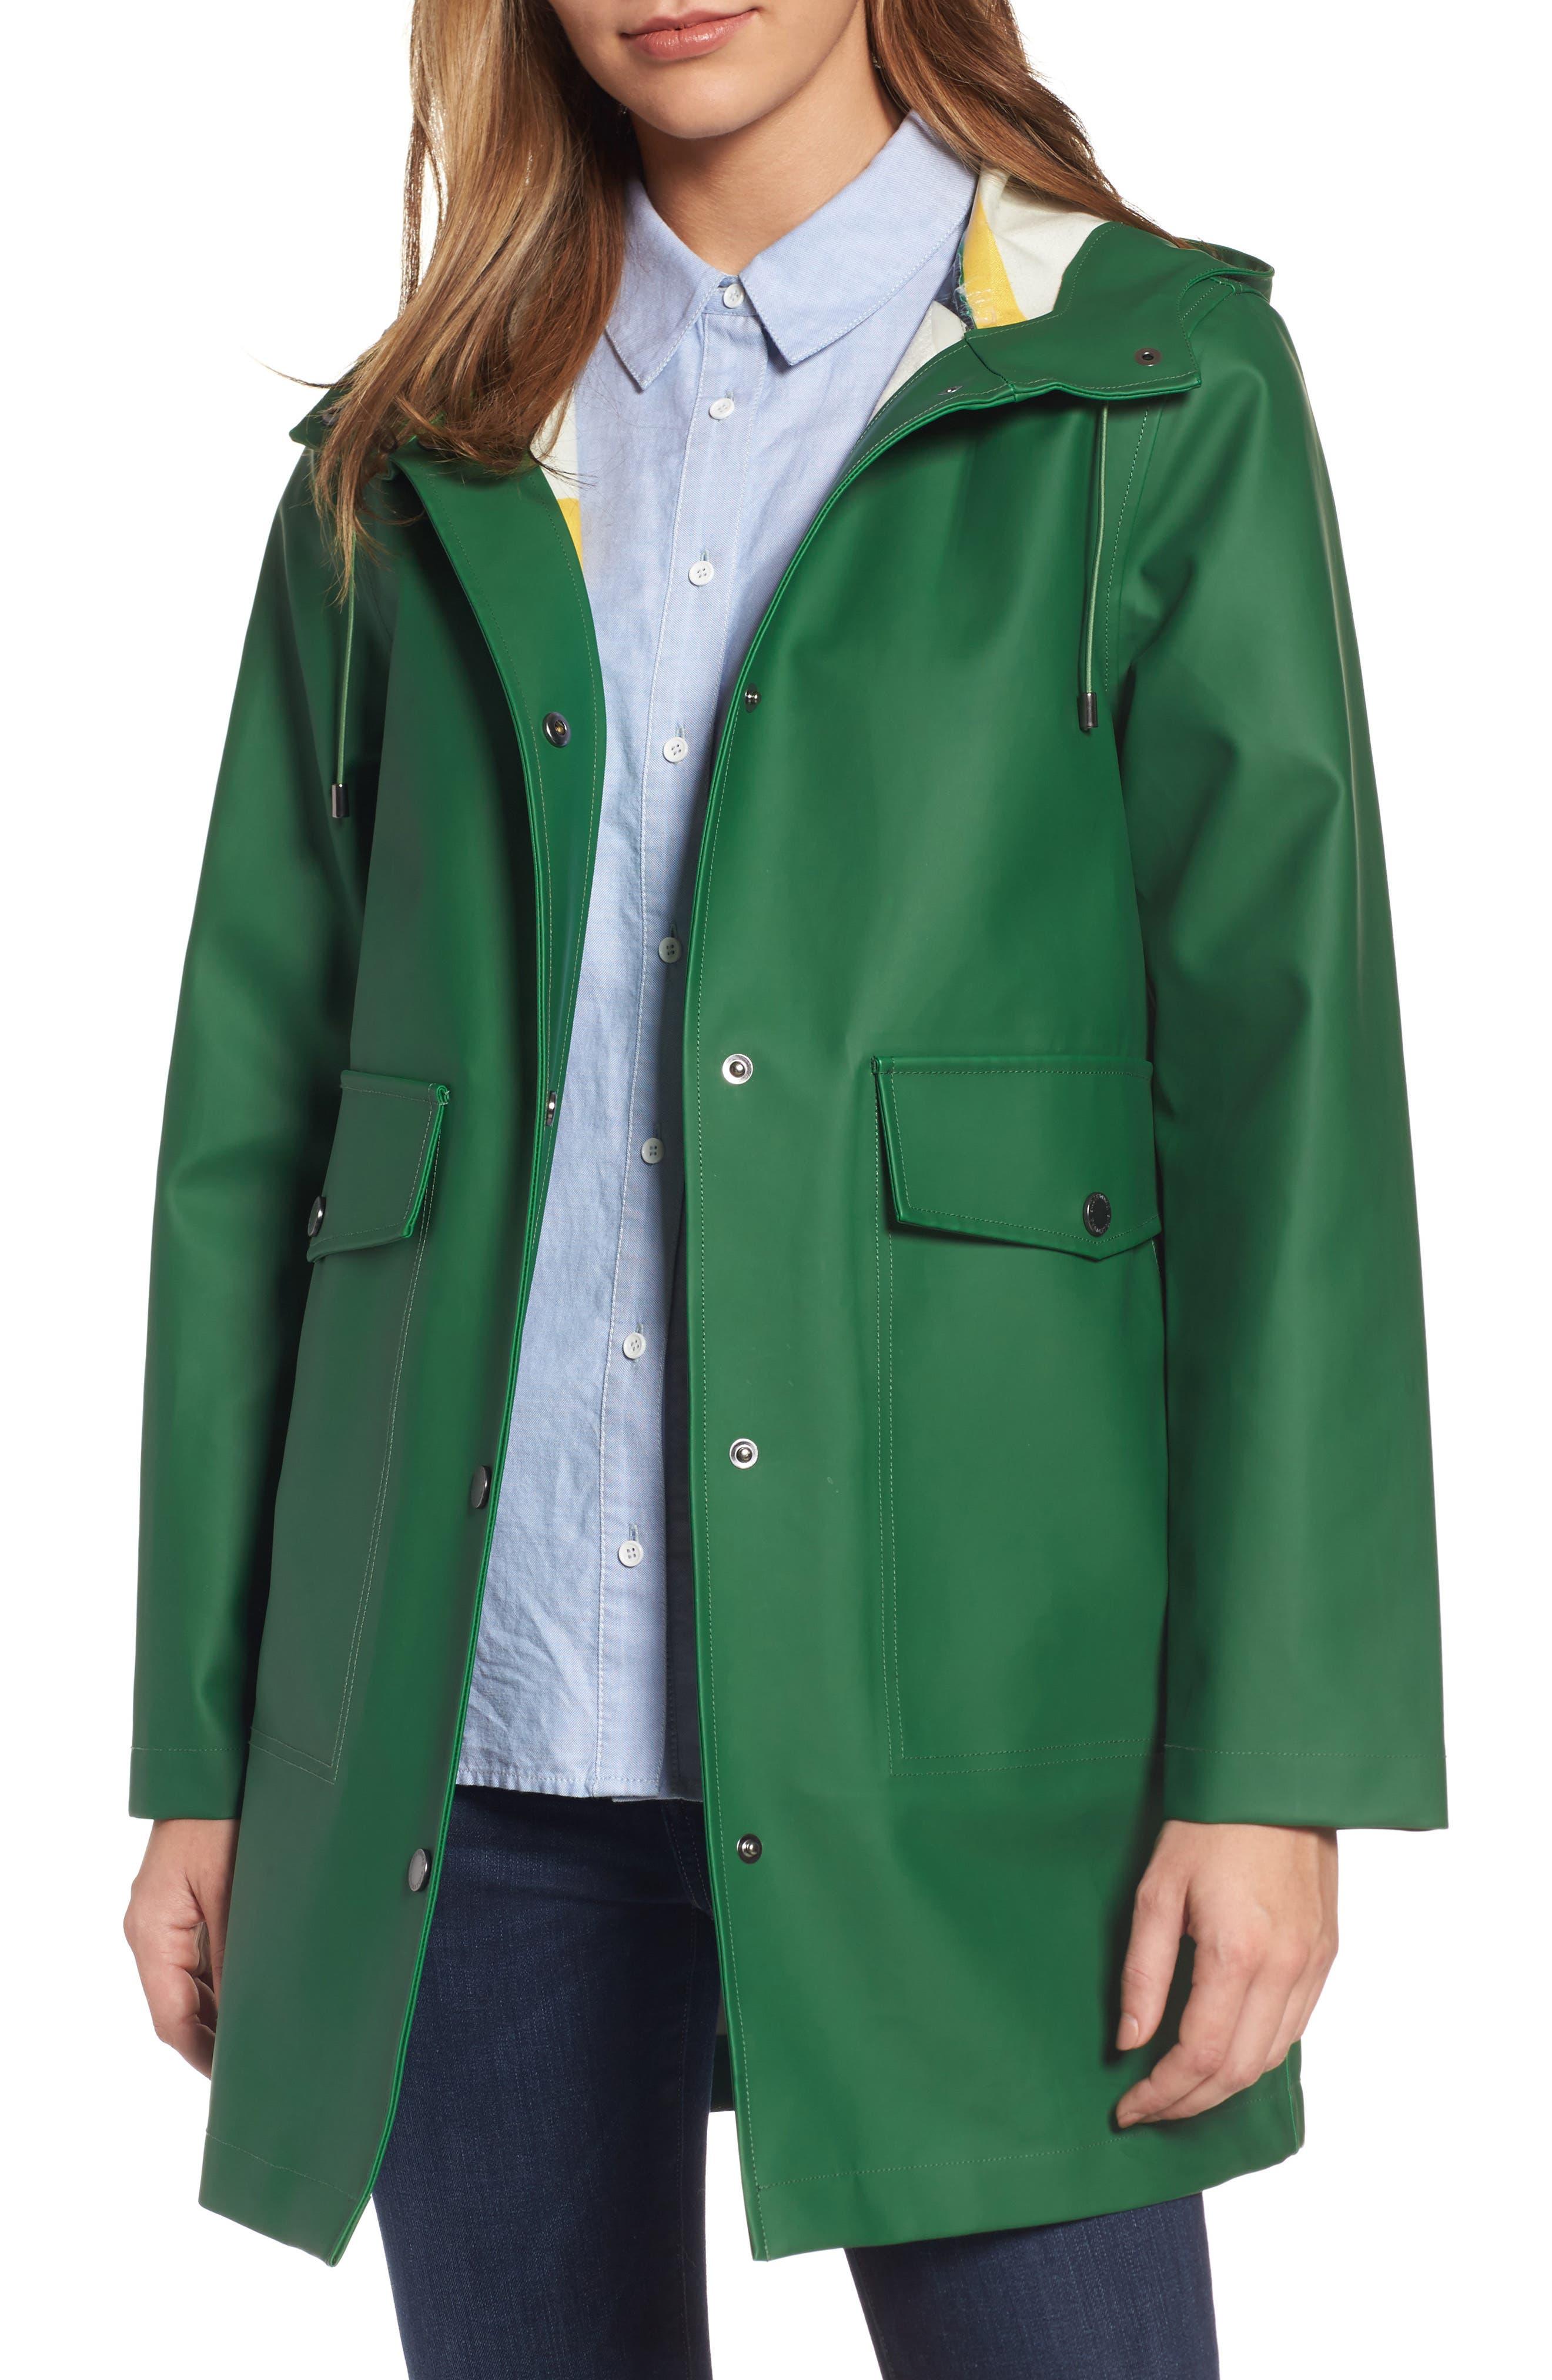 Women's Green Rain Coats & Jackets | Nordstrom